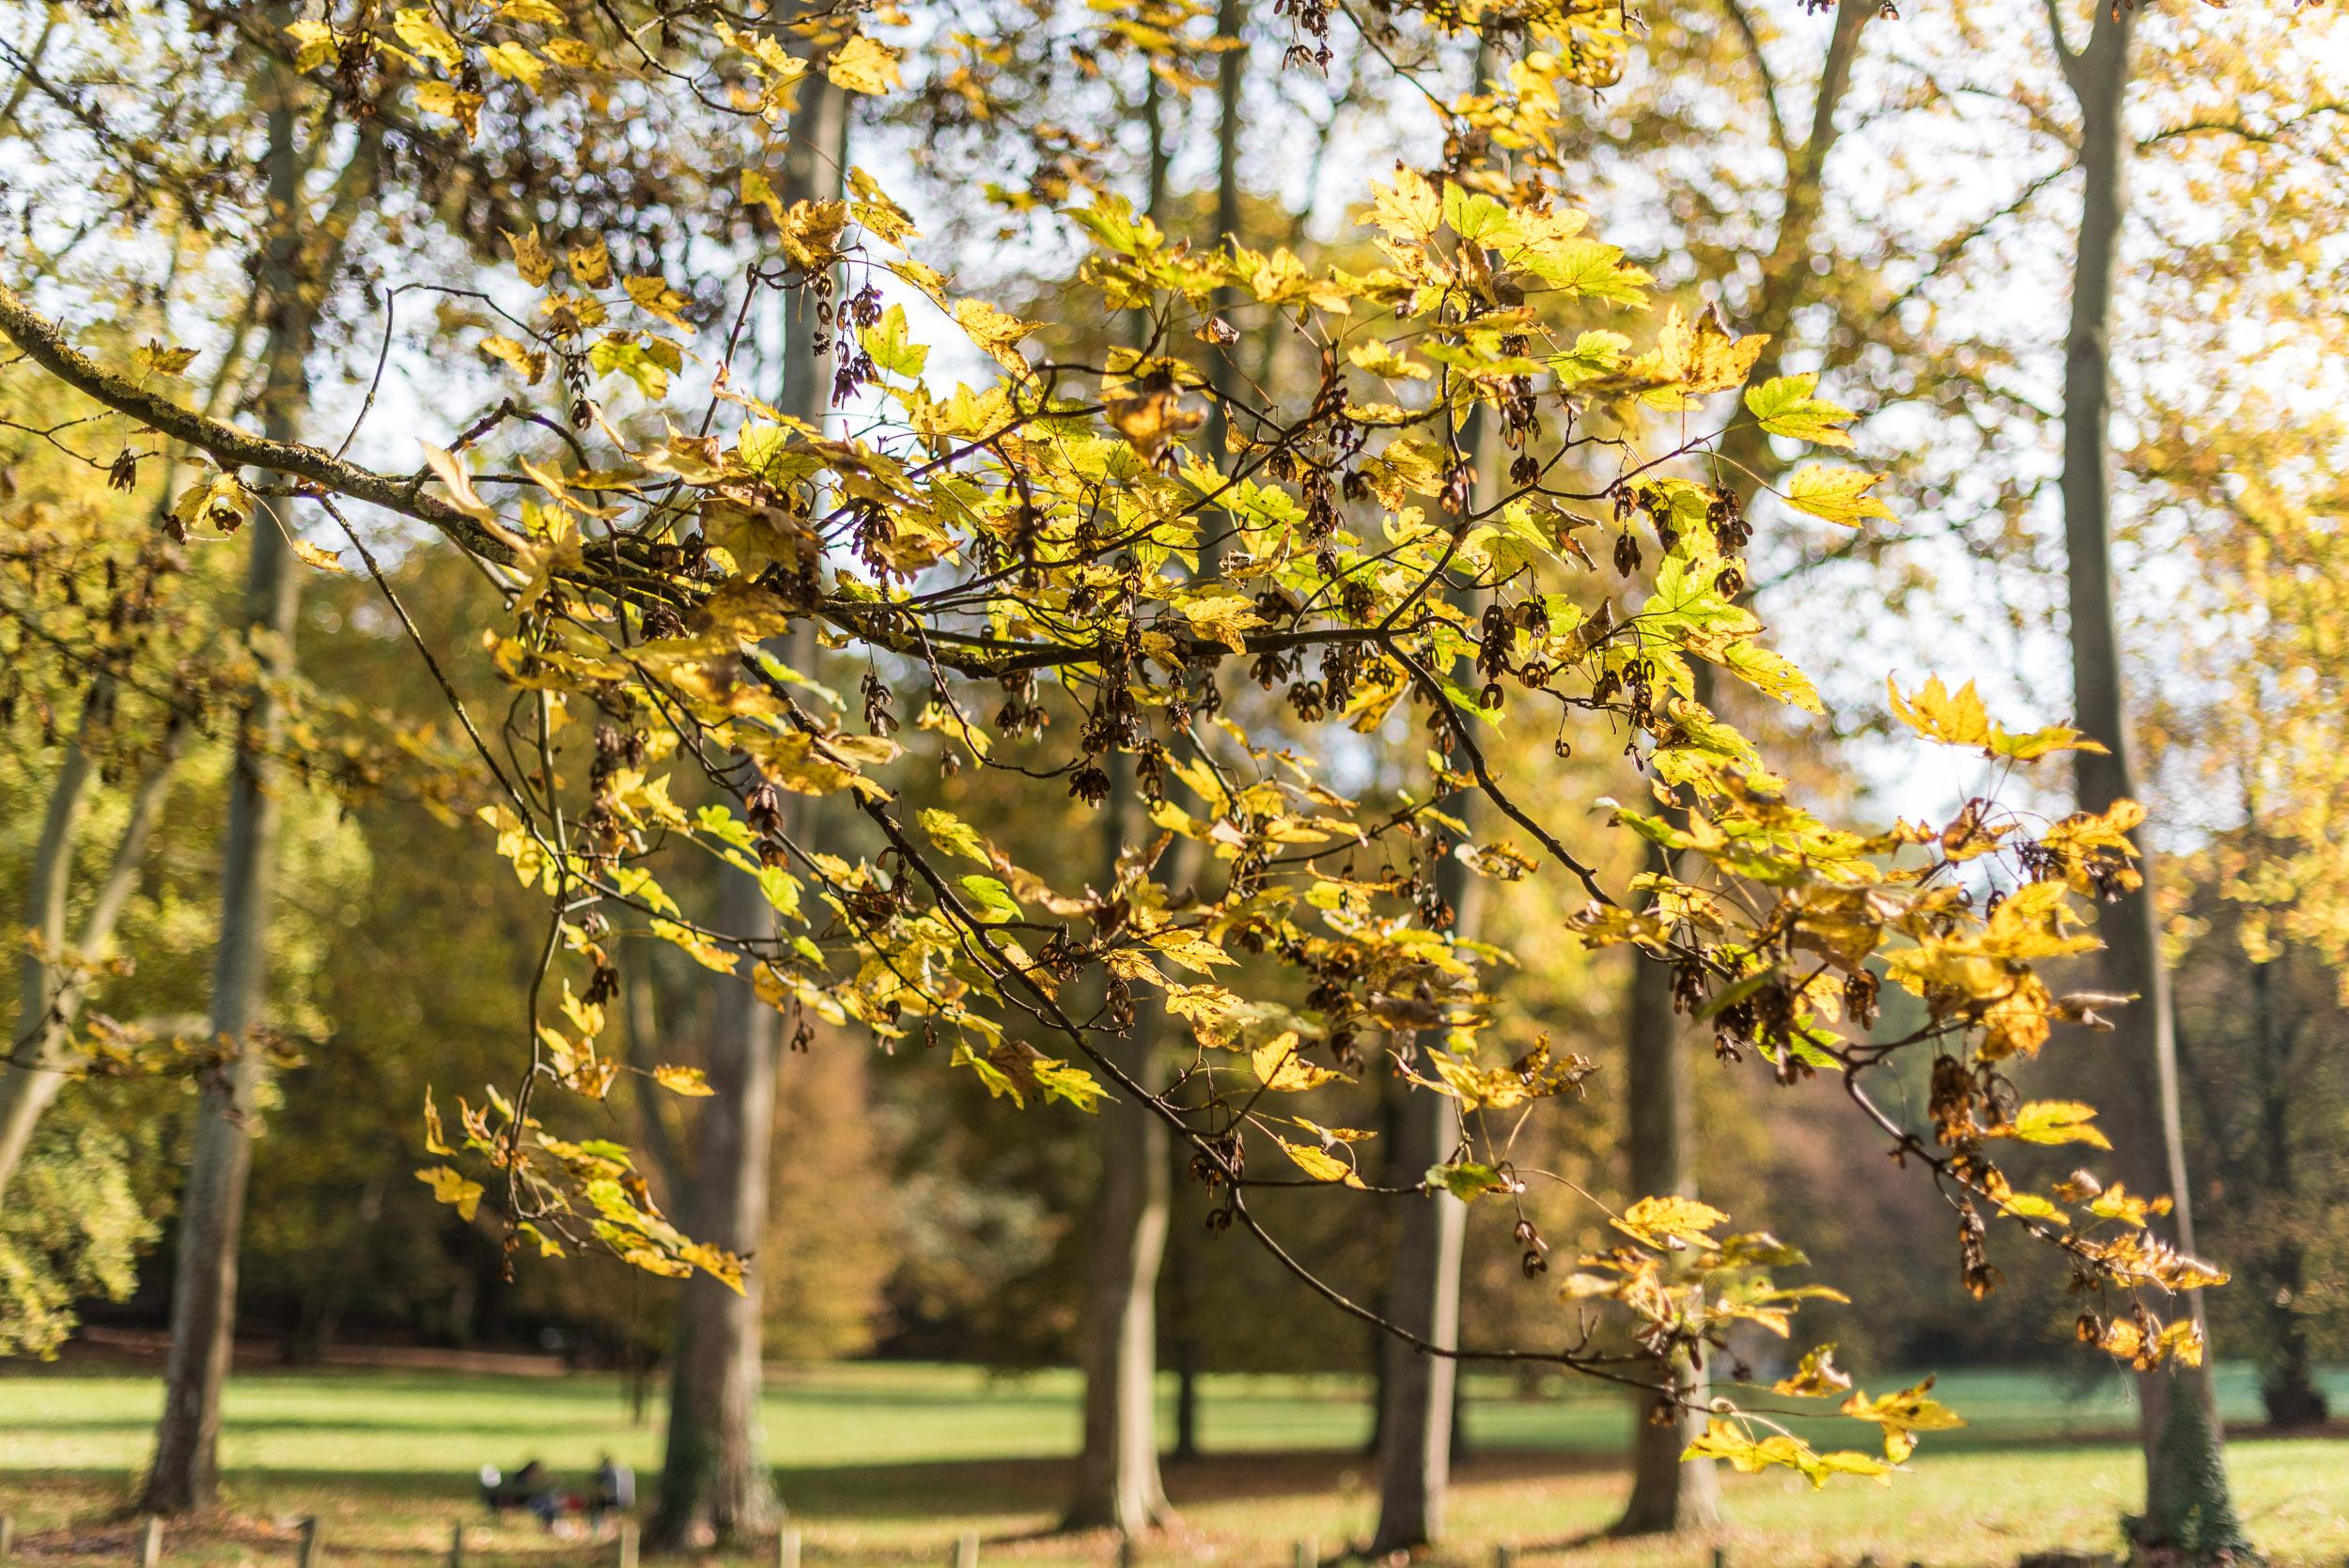 branche d'arbre en automne